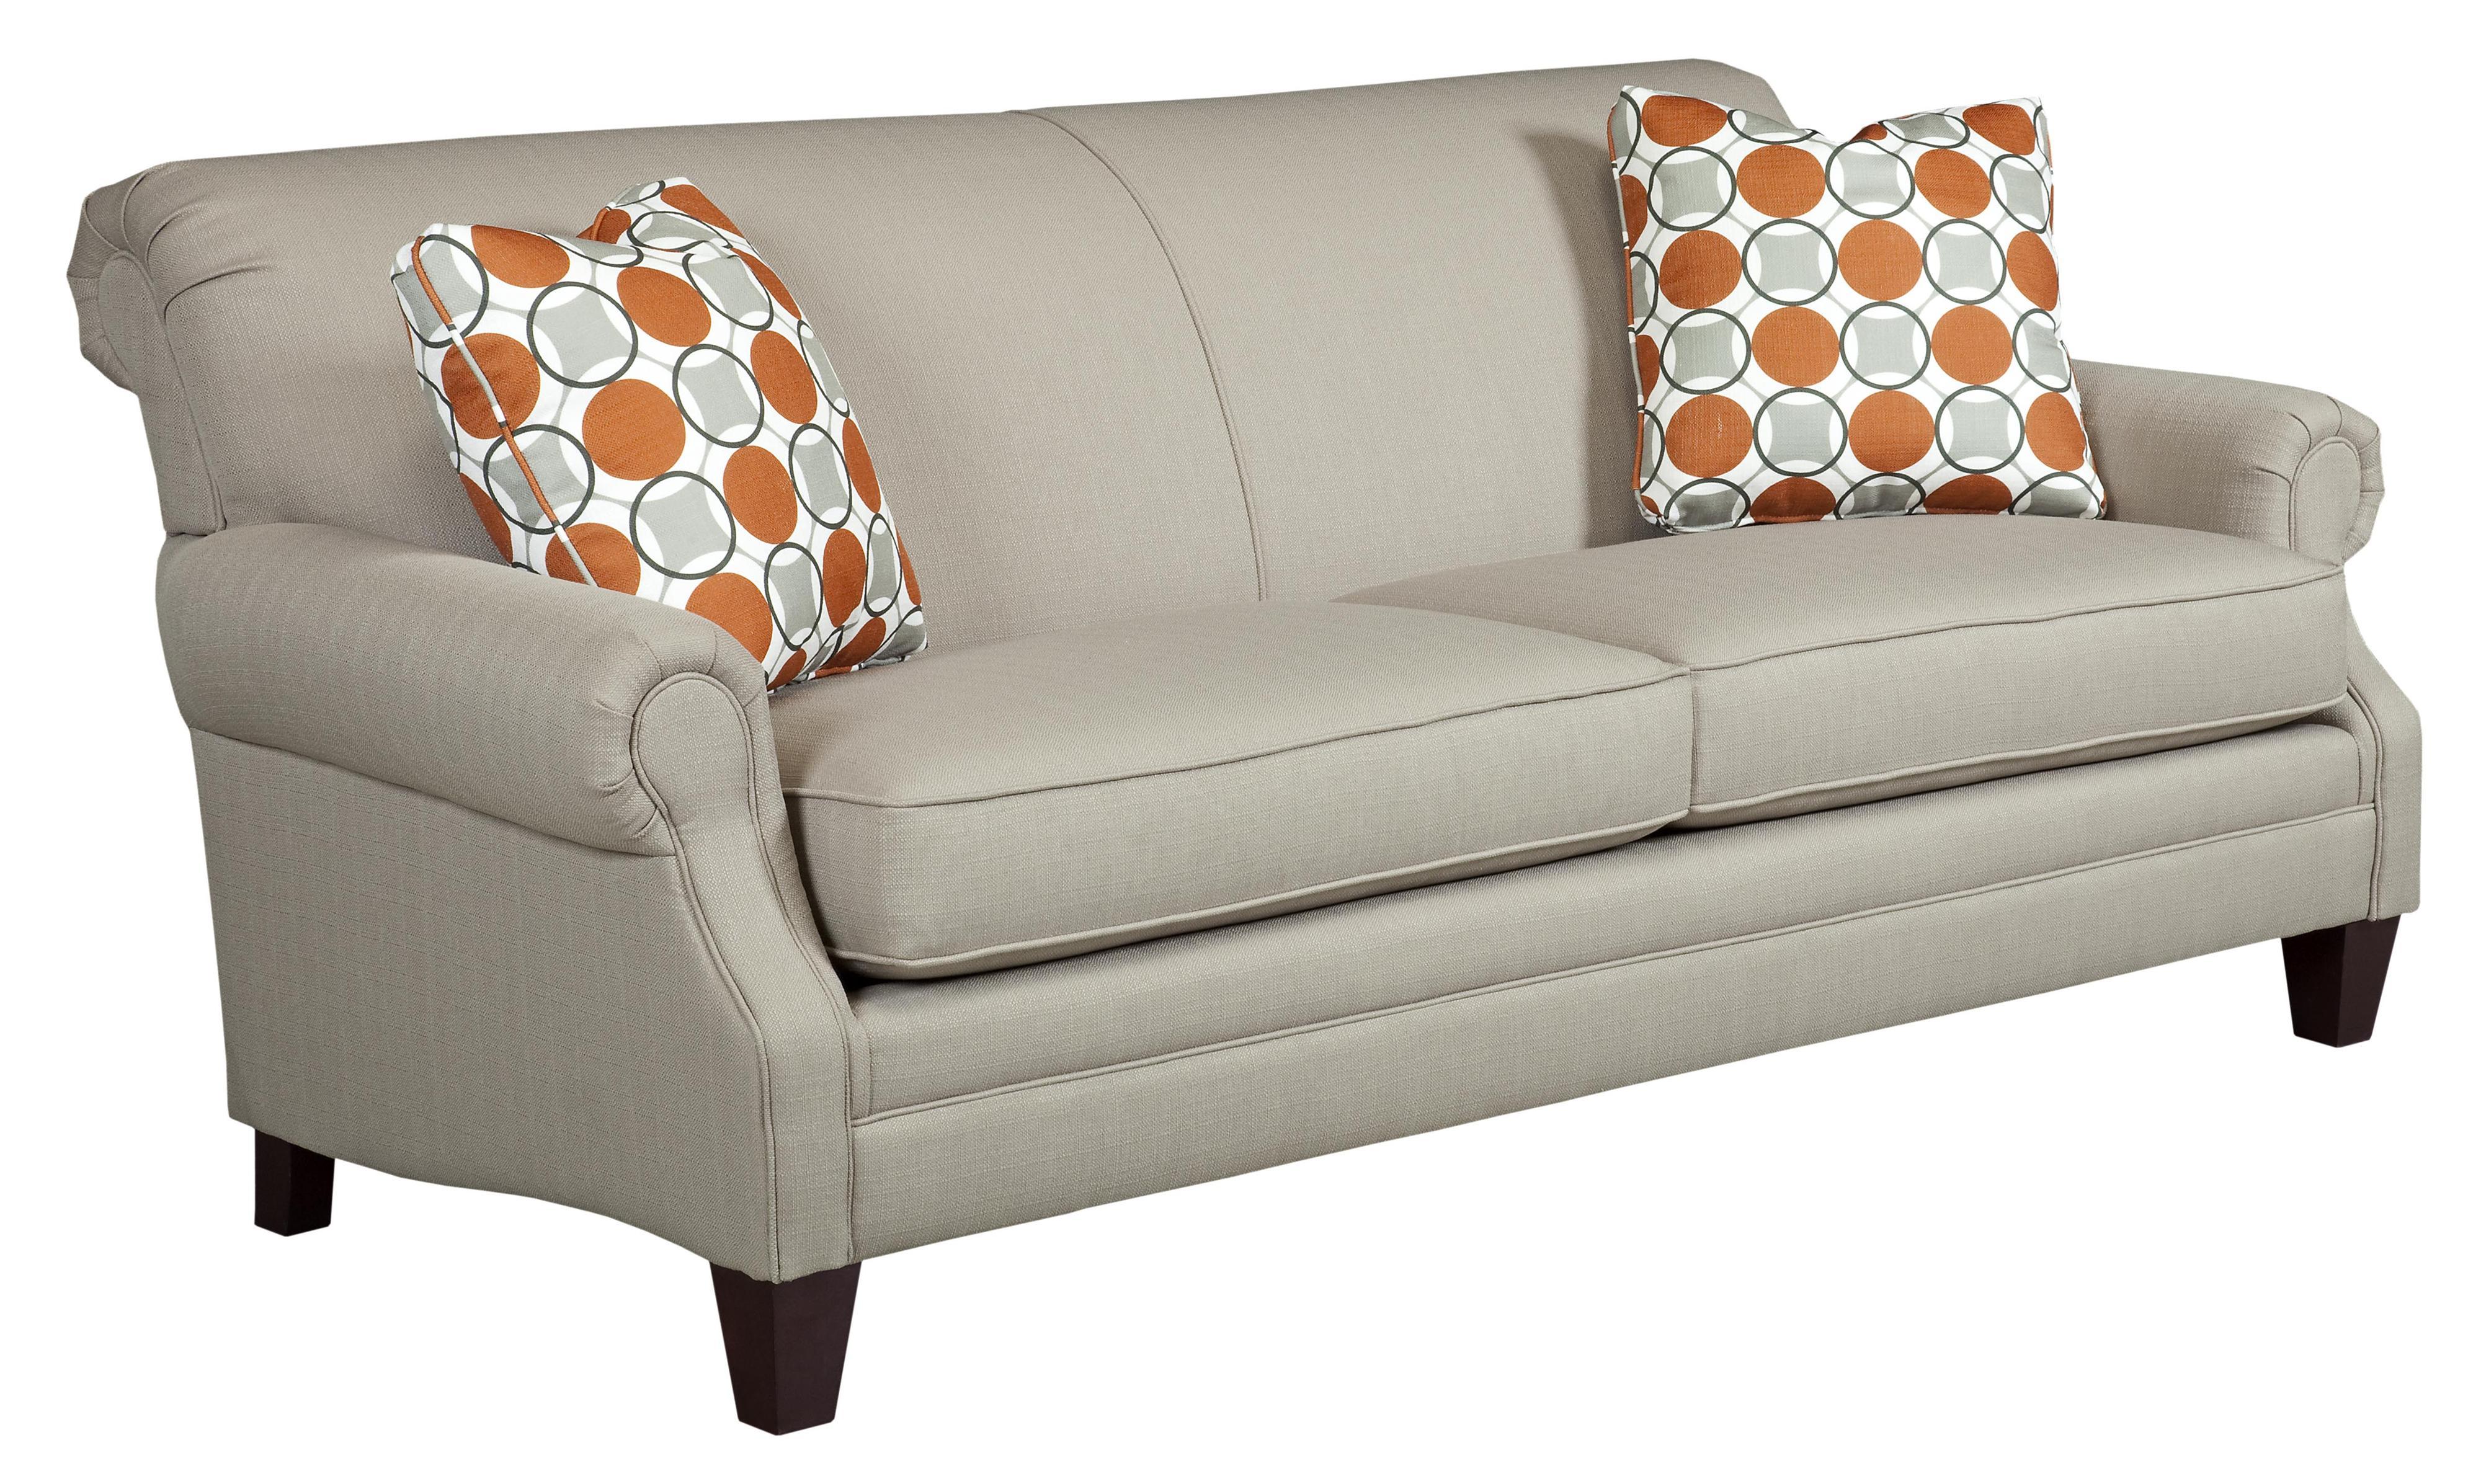 Destin Stationary Sofa by Kincaid Furniture at Johnny Janosik